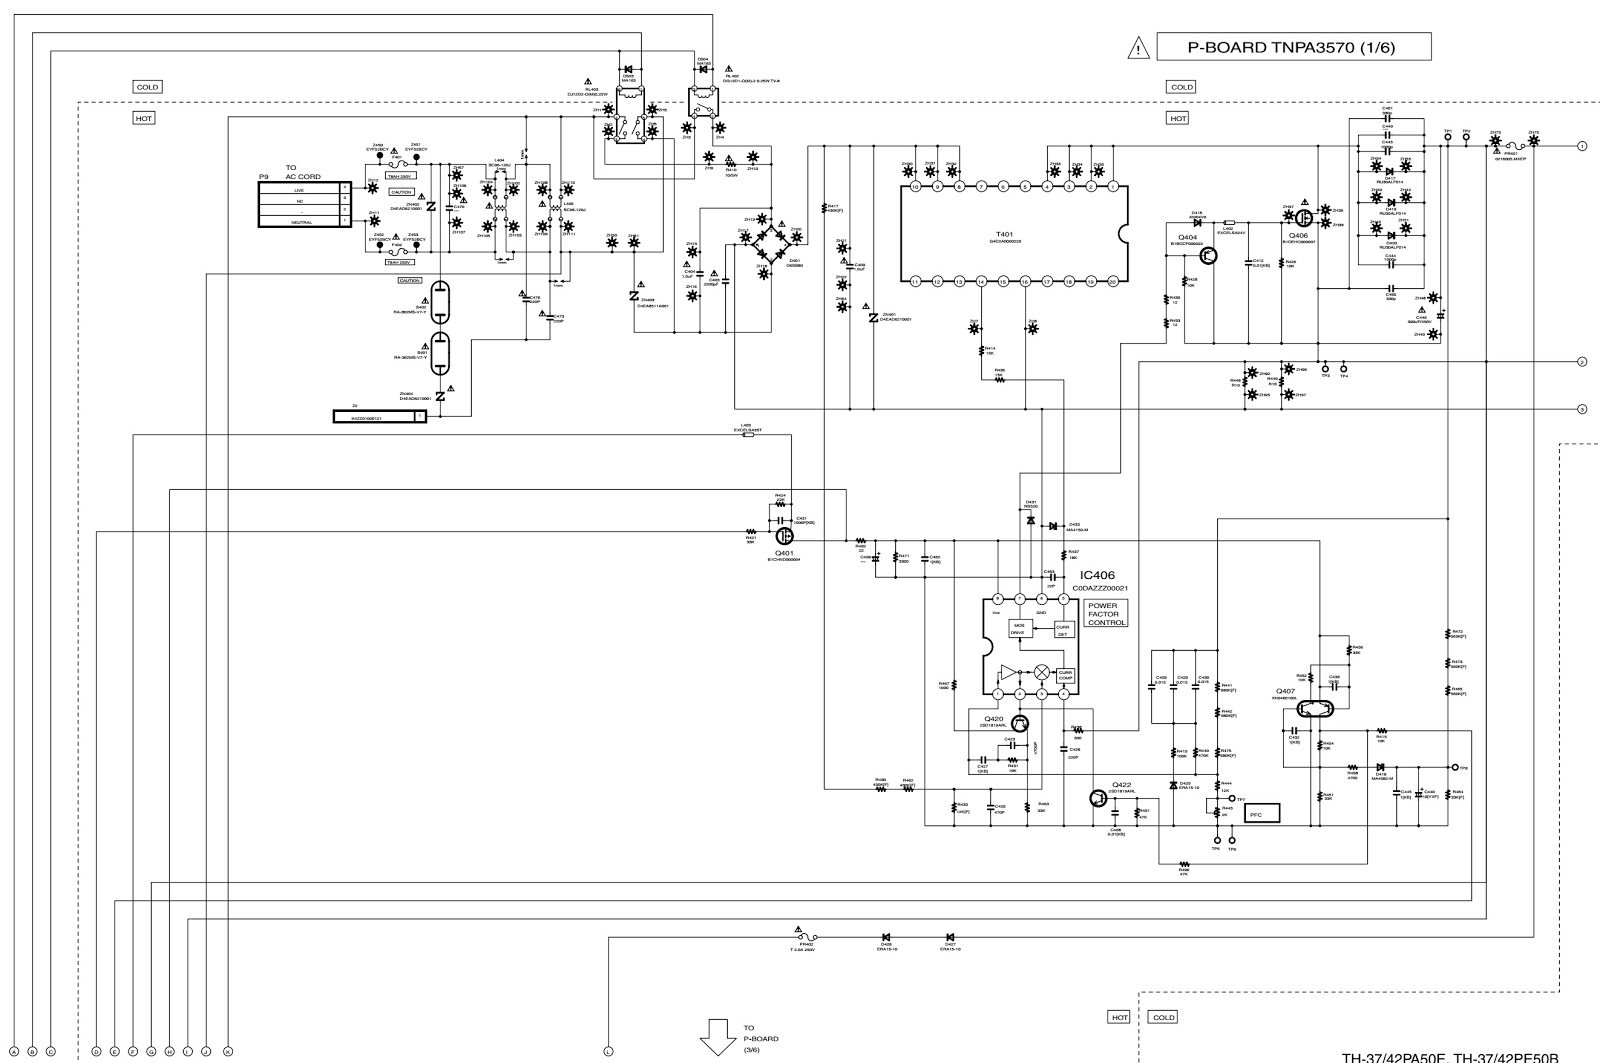 hight resolution of panasonic plasma tv th42 th37 power board schematic panasonic tv parts direct panasonic tv parts direct